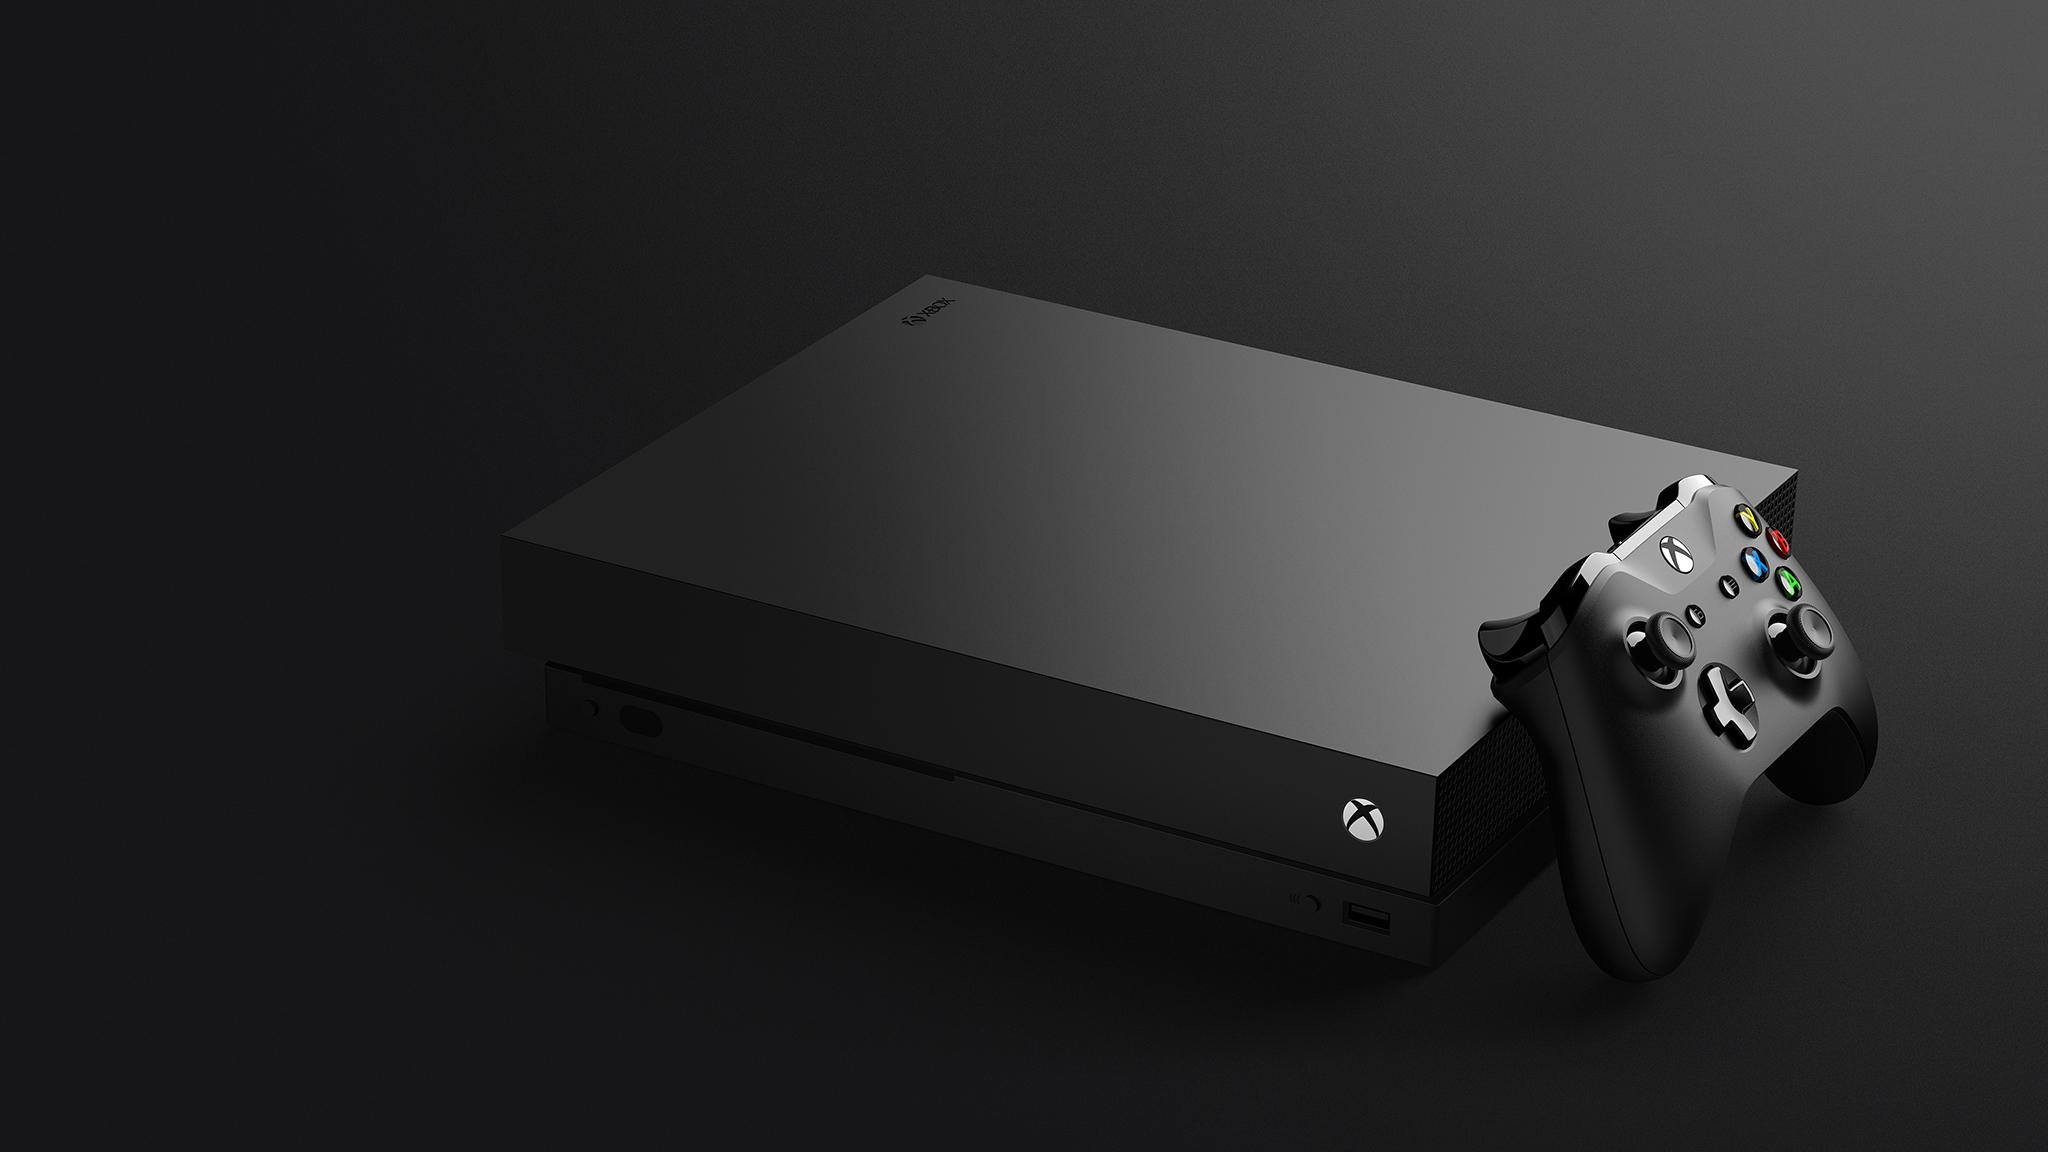 Games Inbox: Naming the next Xbox, Apex Legends vs. Fortnite, and Nintendo Labo VR impulse purchase